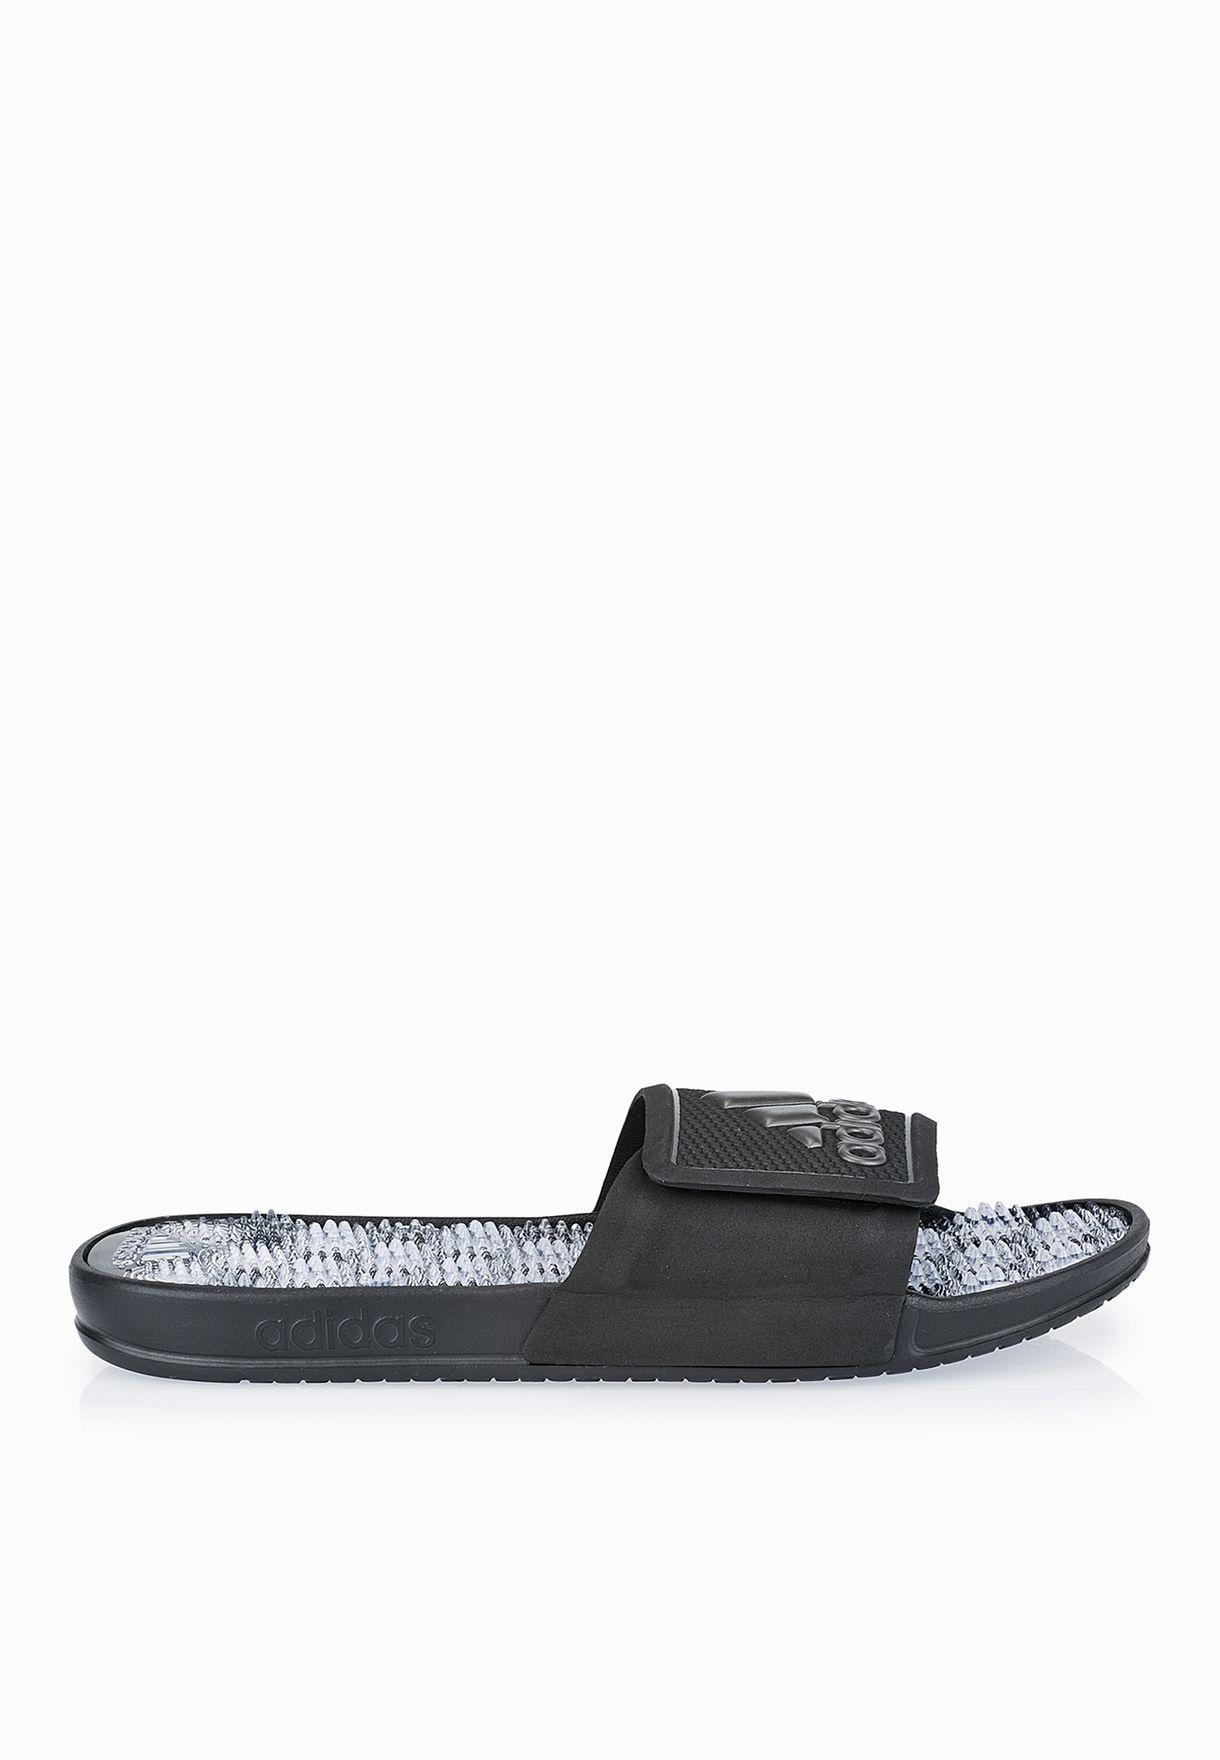 d8ca7c2c8227ce Shop adidas black Adissage 2.0 S78500 for Men in Oman - AD476SH02OJP